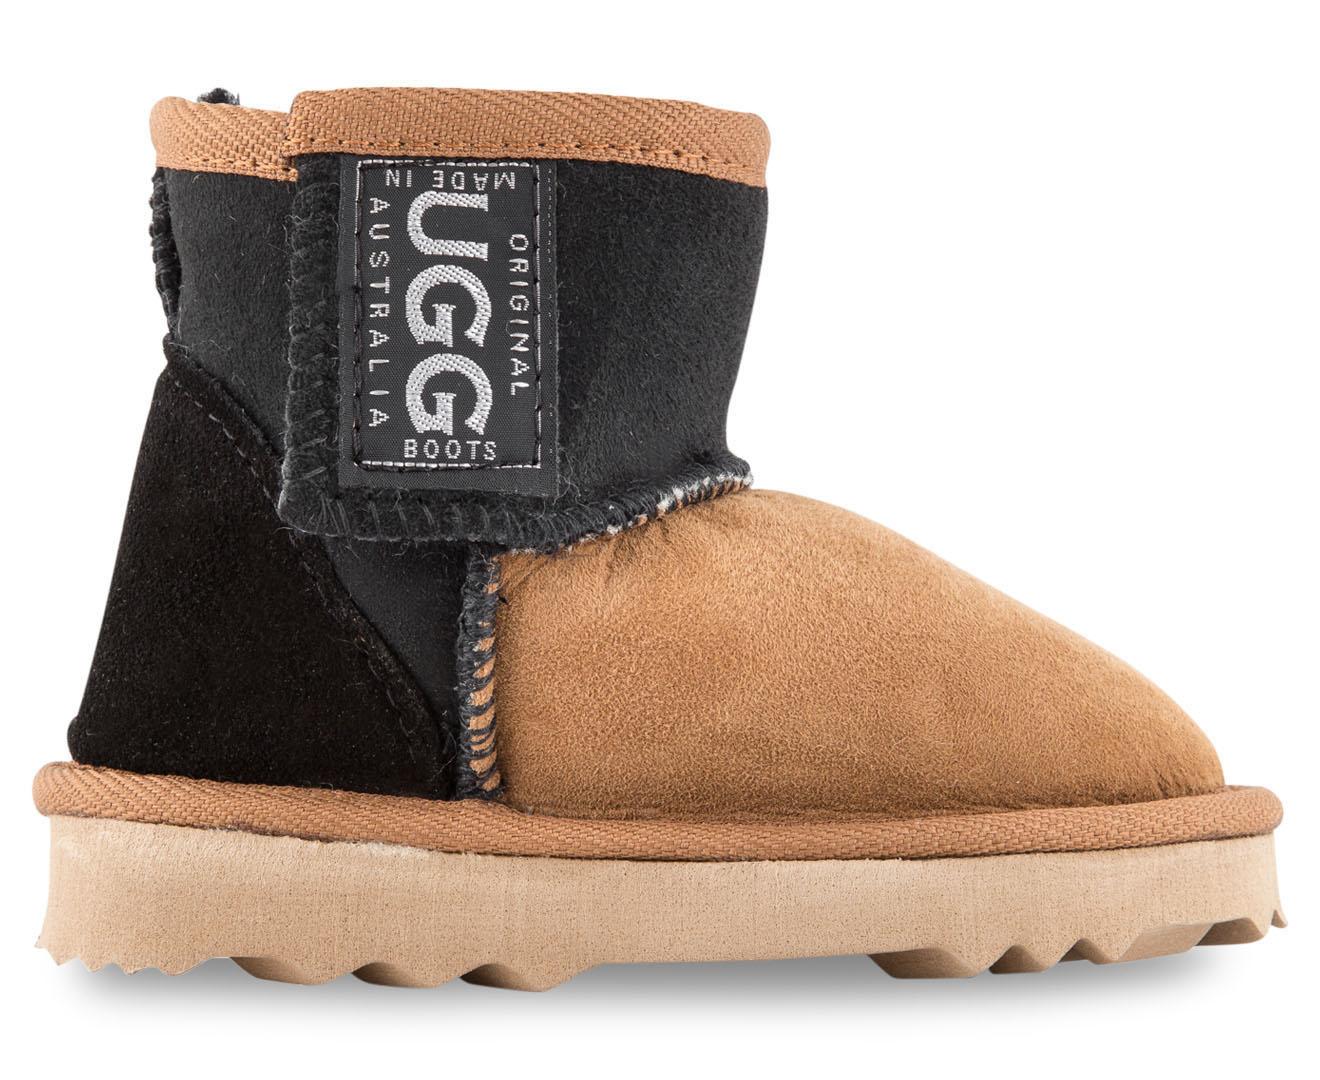 3fdae474ca4 Original UGG Boots Kids' Two Tone Walker Boot - Chestnut/Black ...